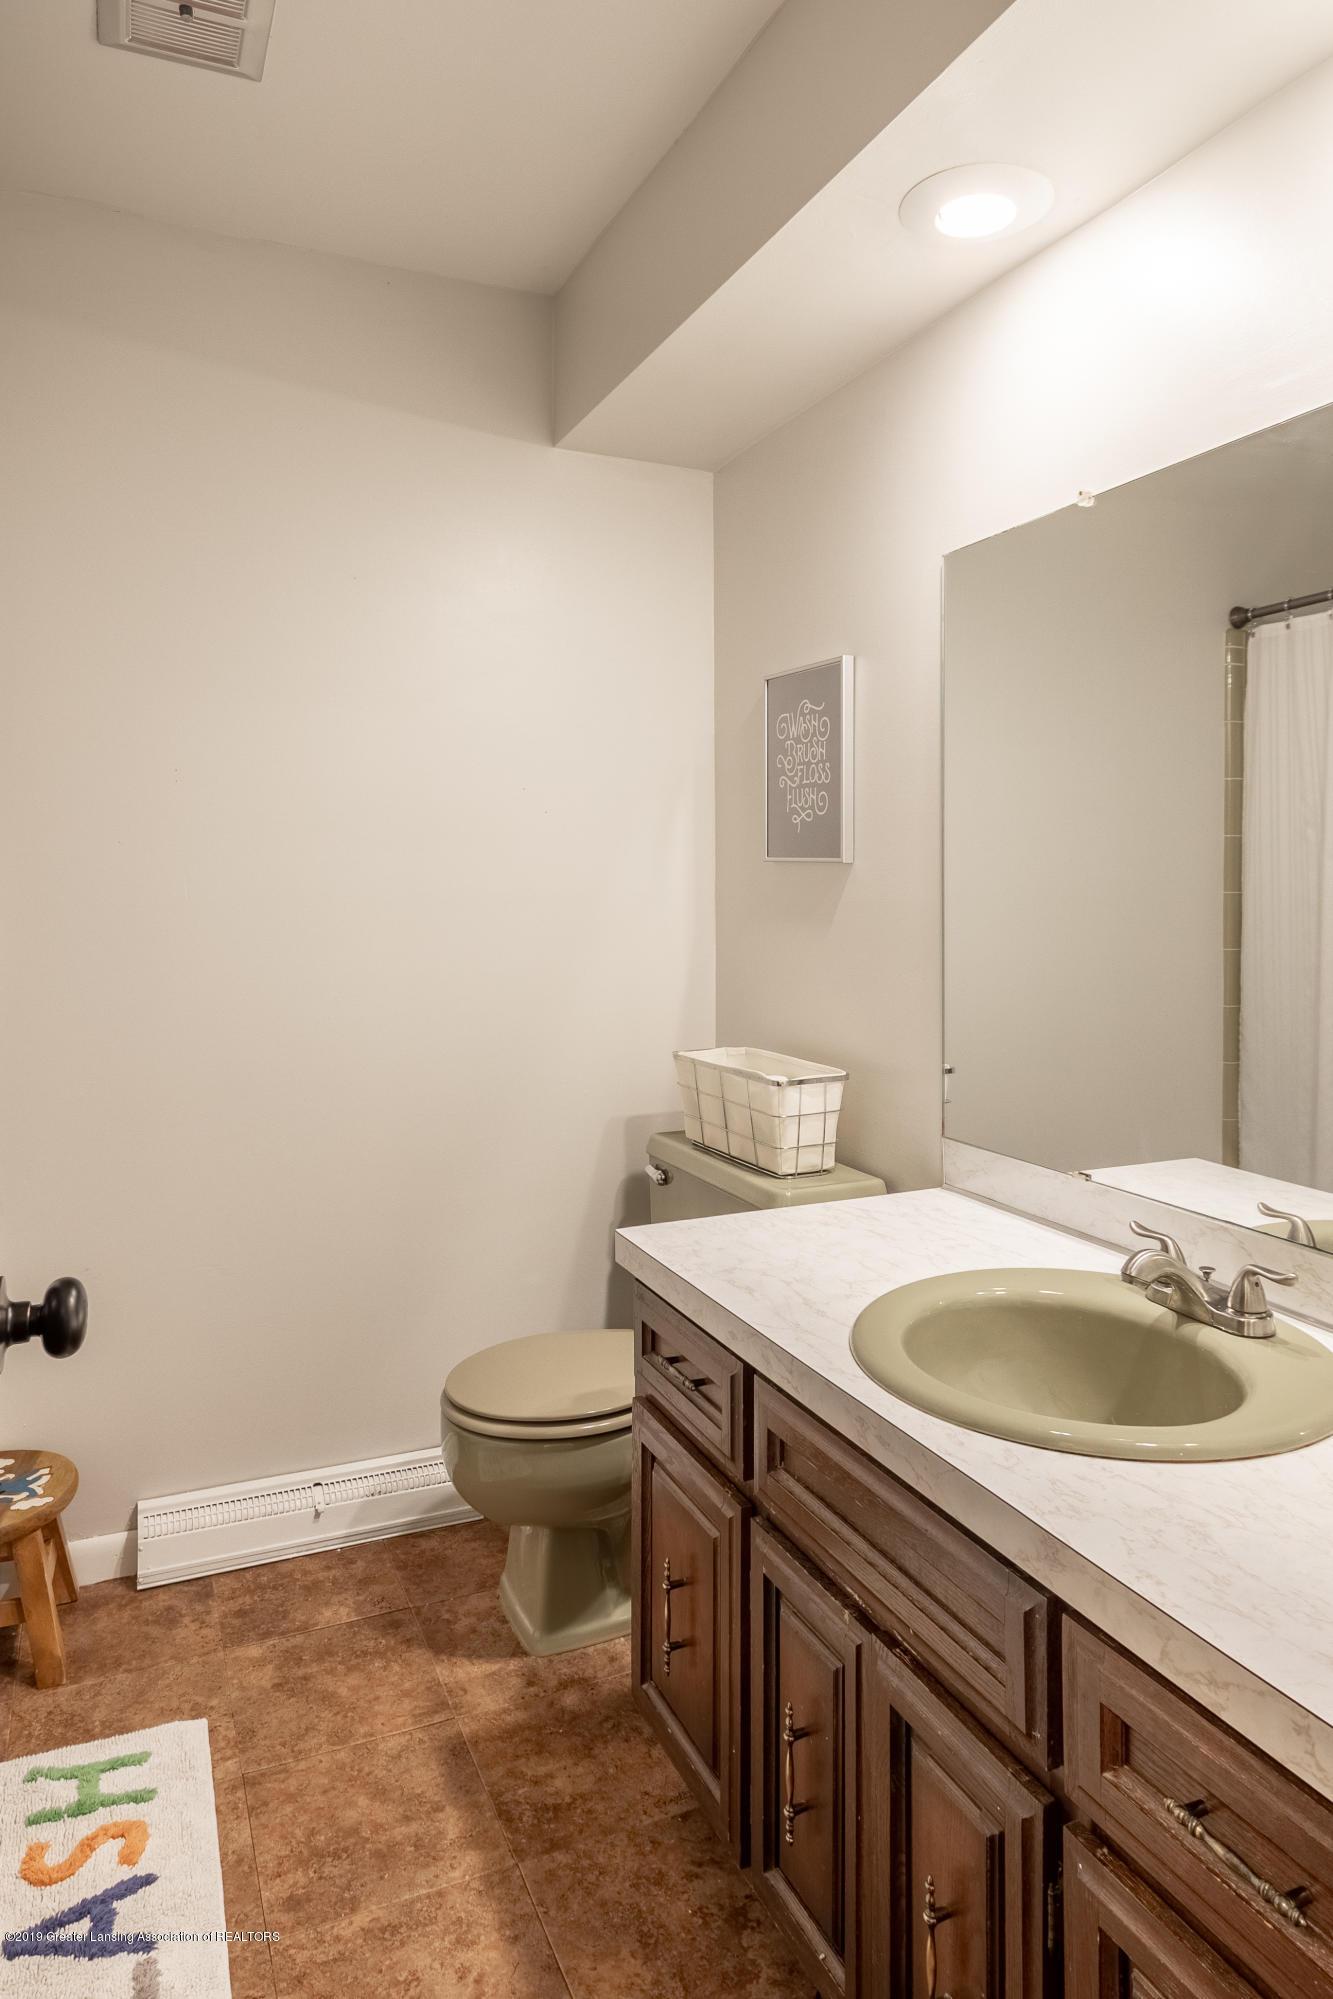 3539 W Hiawatha Dr - Main bathroom - 24